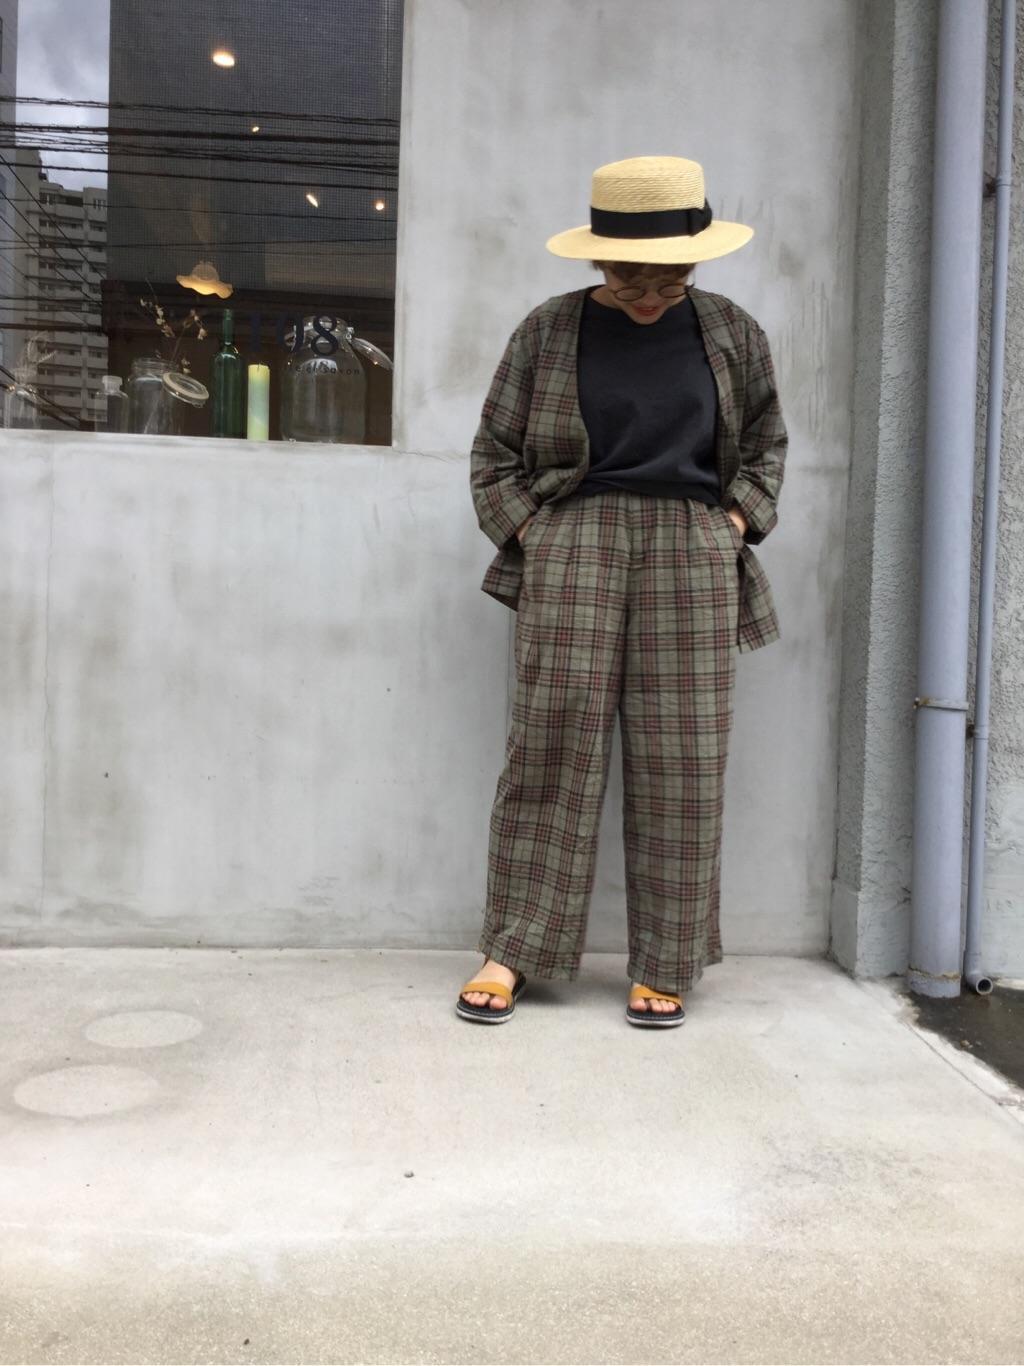 108 yuni / bulle de savon 福岡薬院路面 身長:150cm 2019.06.17